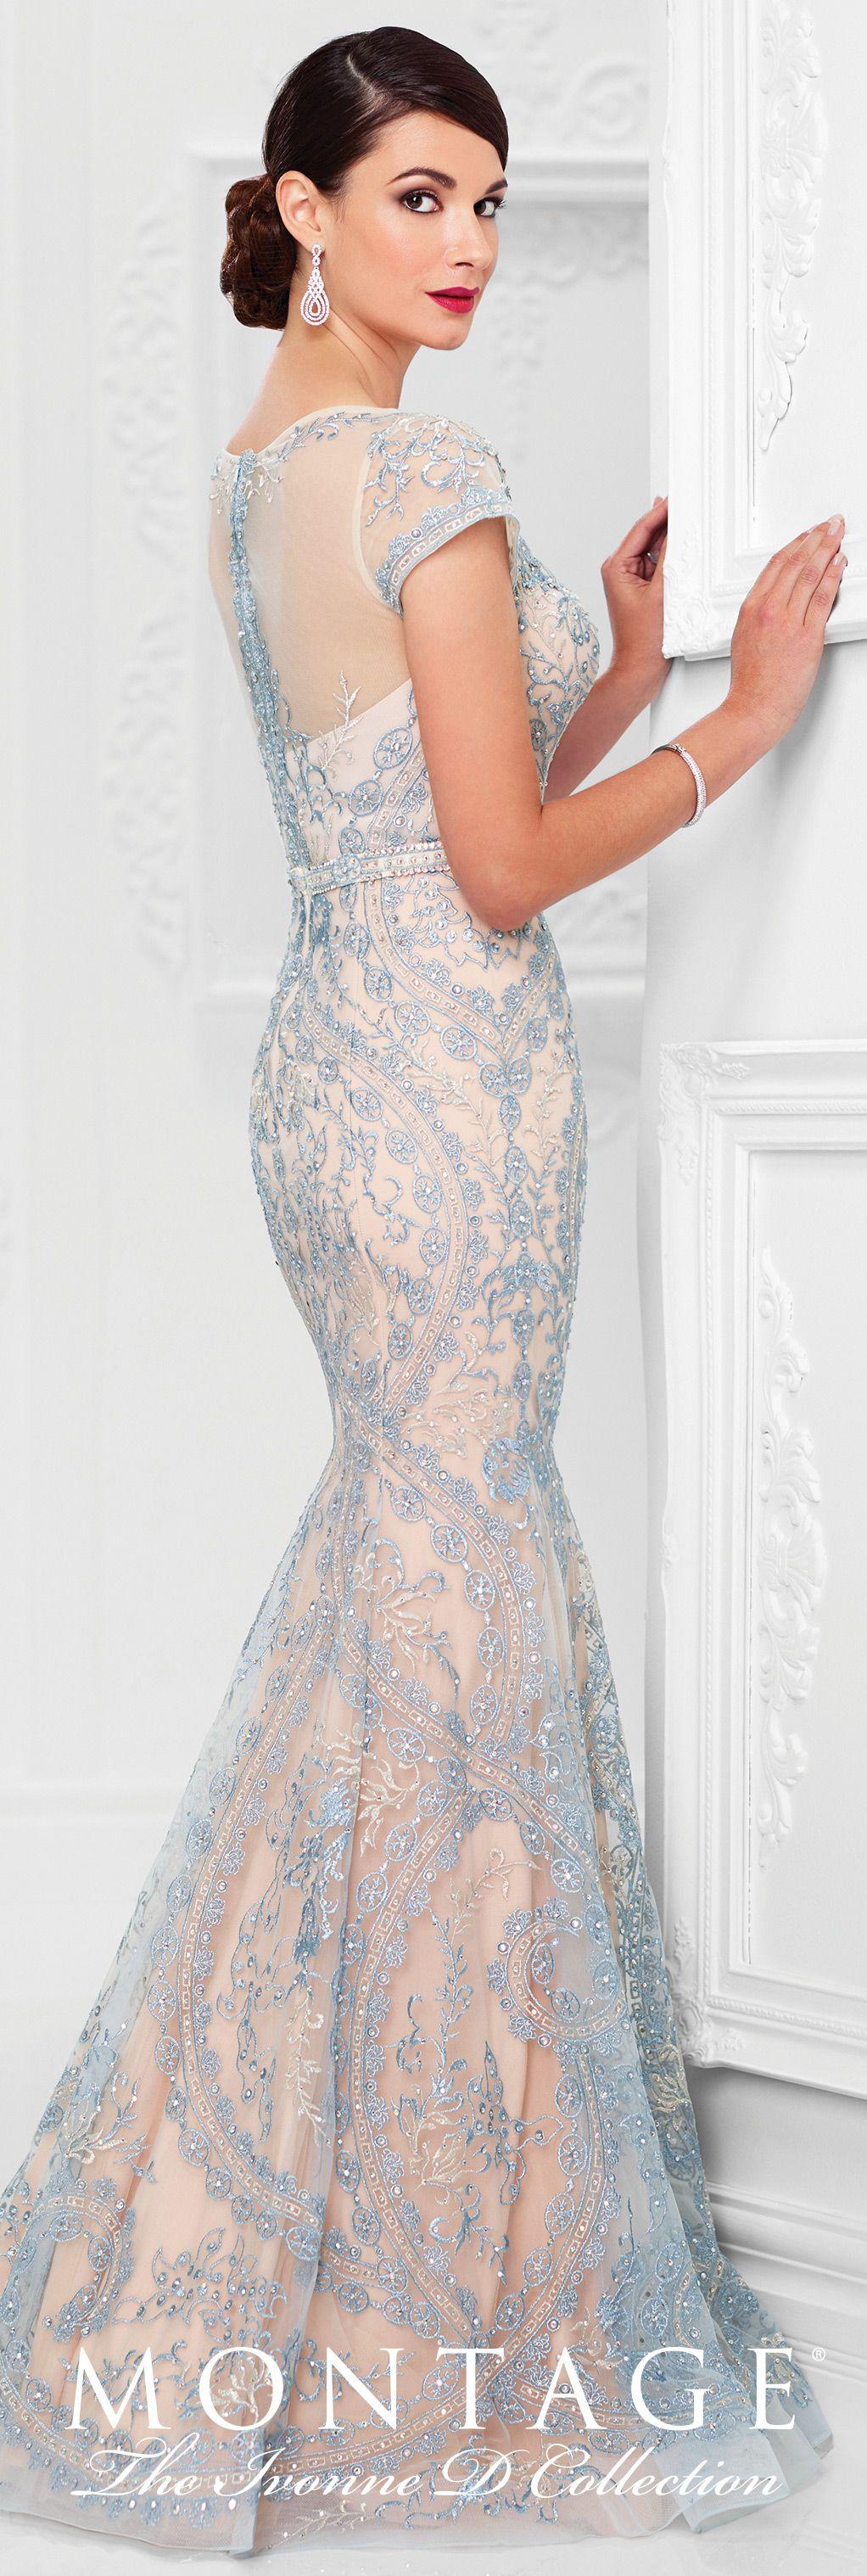 Tulle and Allover Lace Trumpet Gown - Ivonne D 117D70 en 2018 | Moda ...